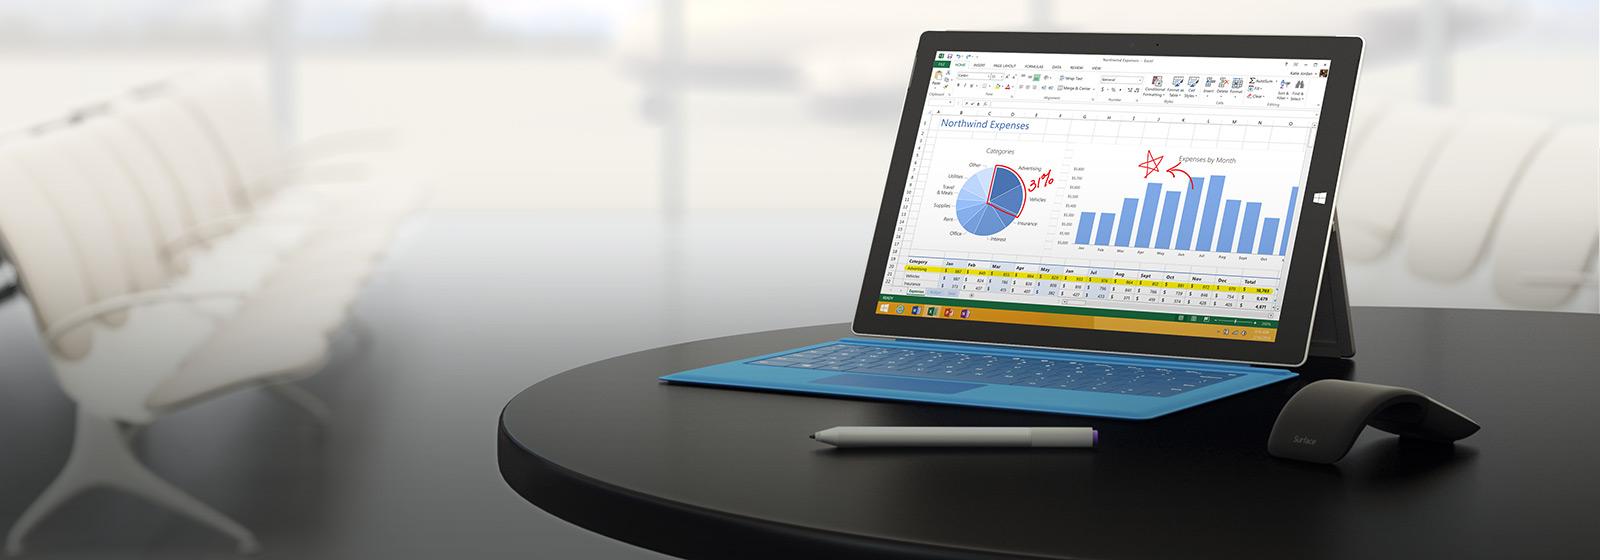 Surface Pro 3 แท็บเล็ตที่ใช้แทนแล็ปท็อปได้